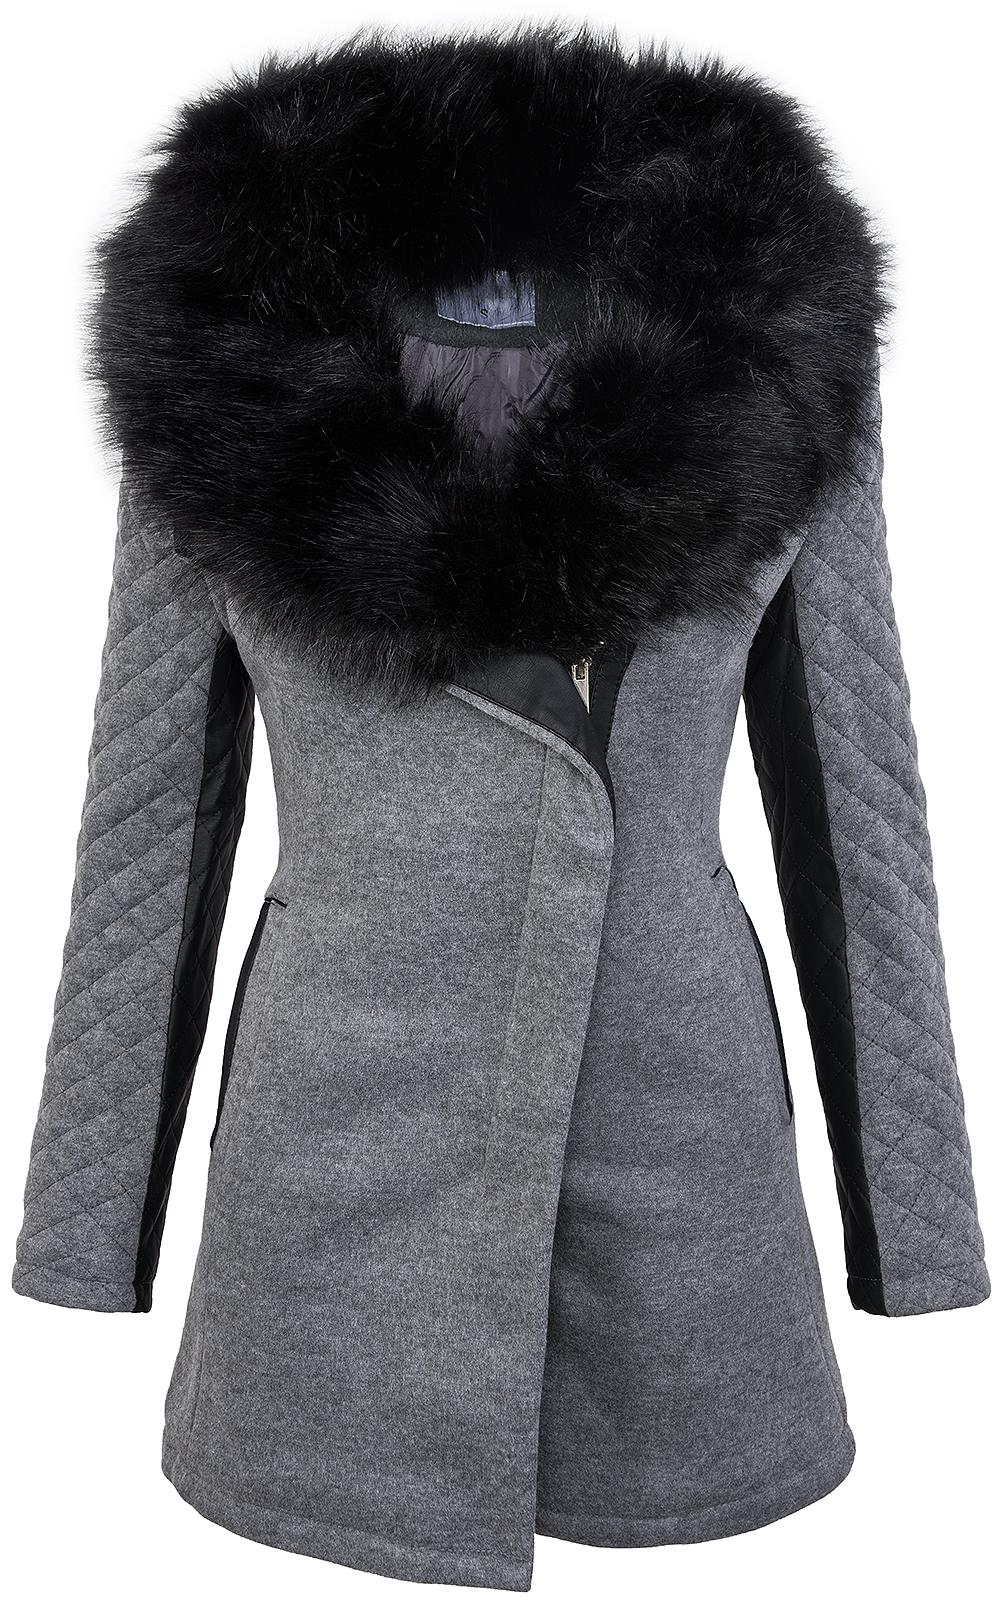 Damen designer winter jacke schwarzer fellkragen jacke mantel wintermantel d 234 - Schwarzer wintermantel damen ...